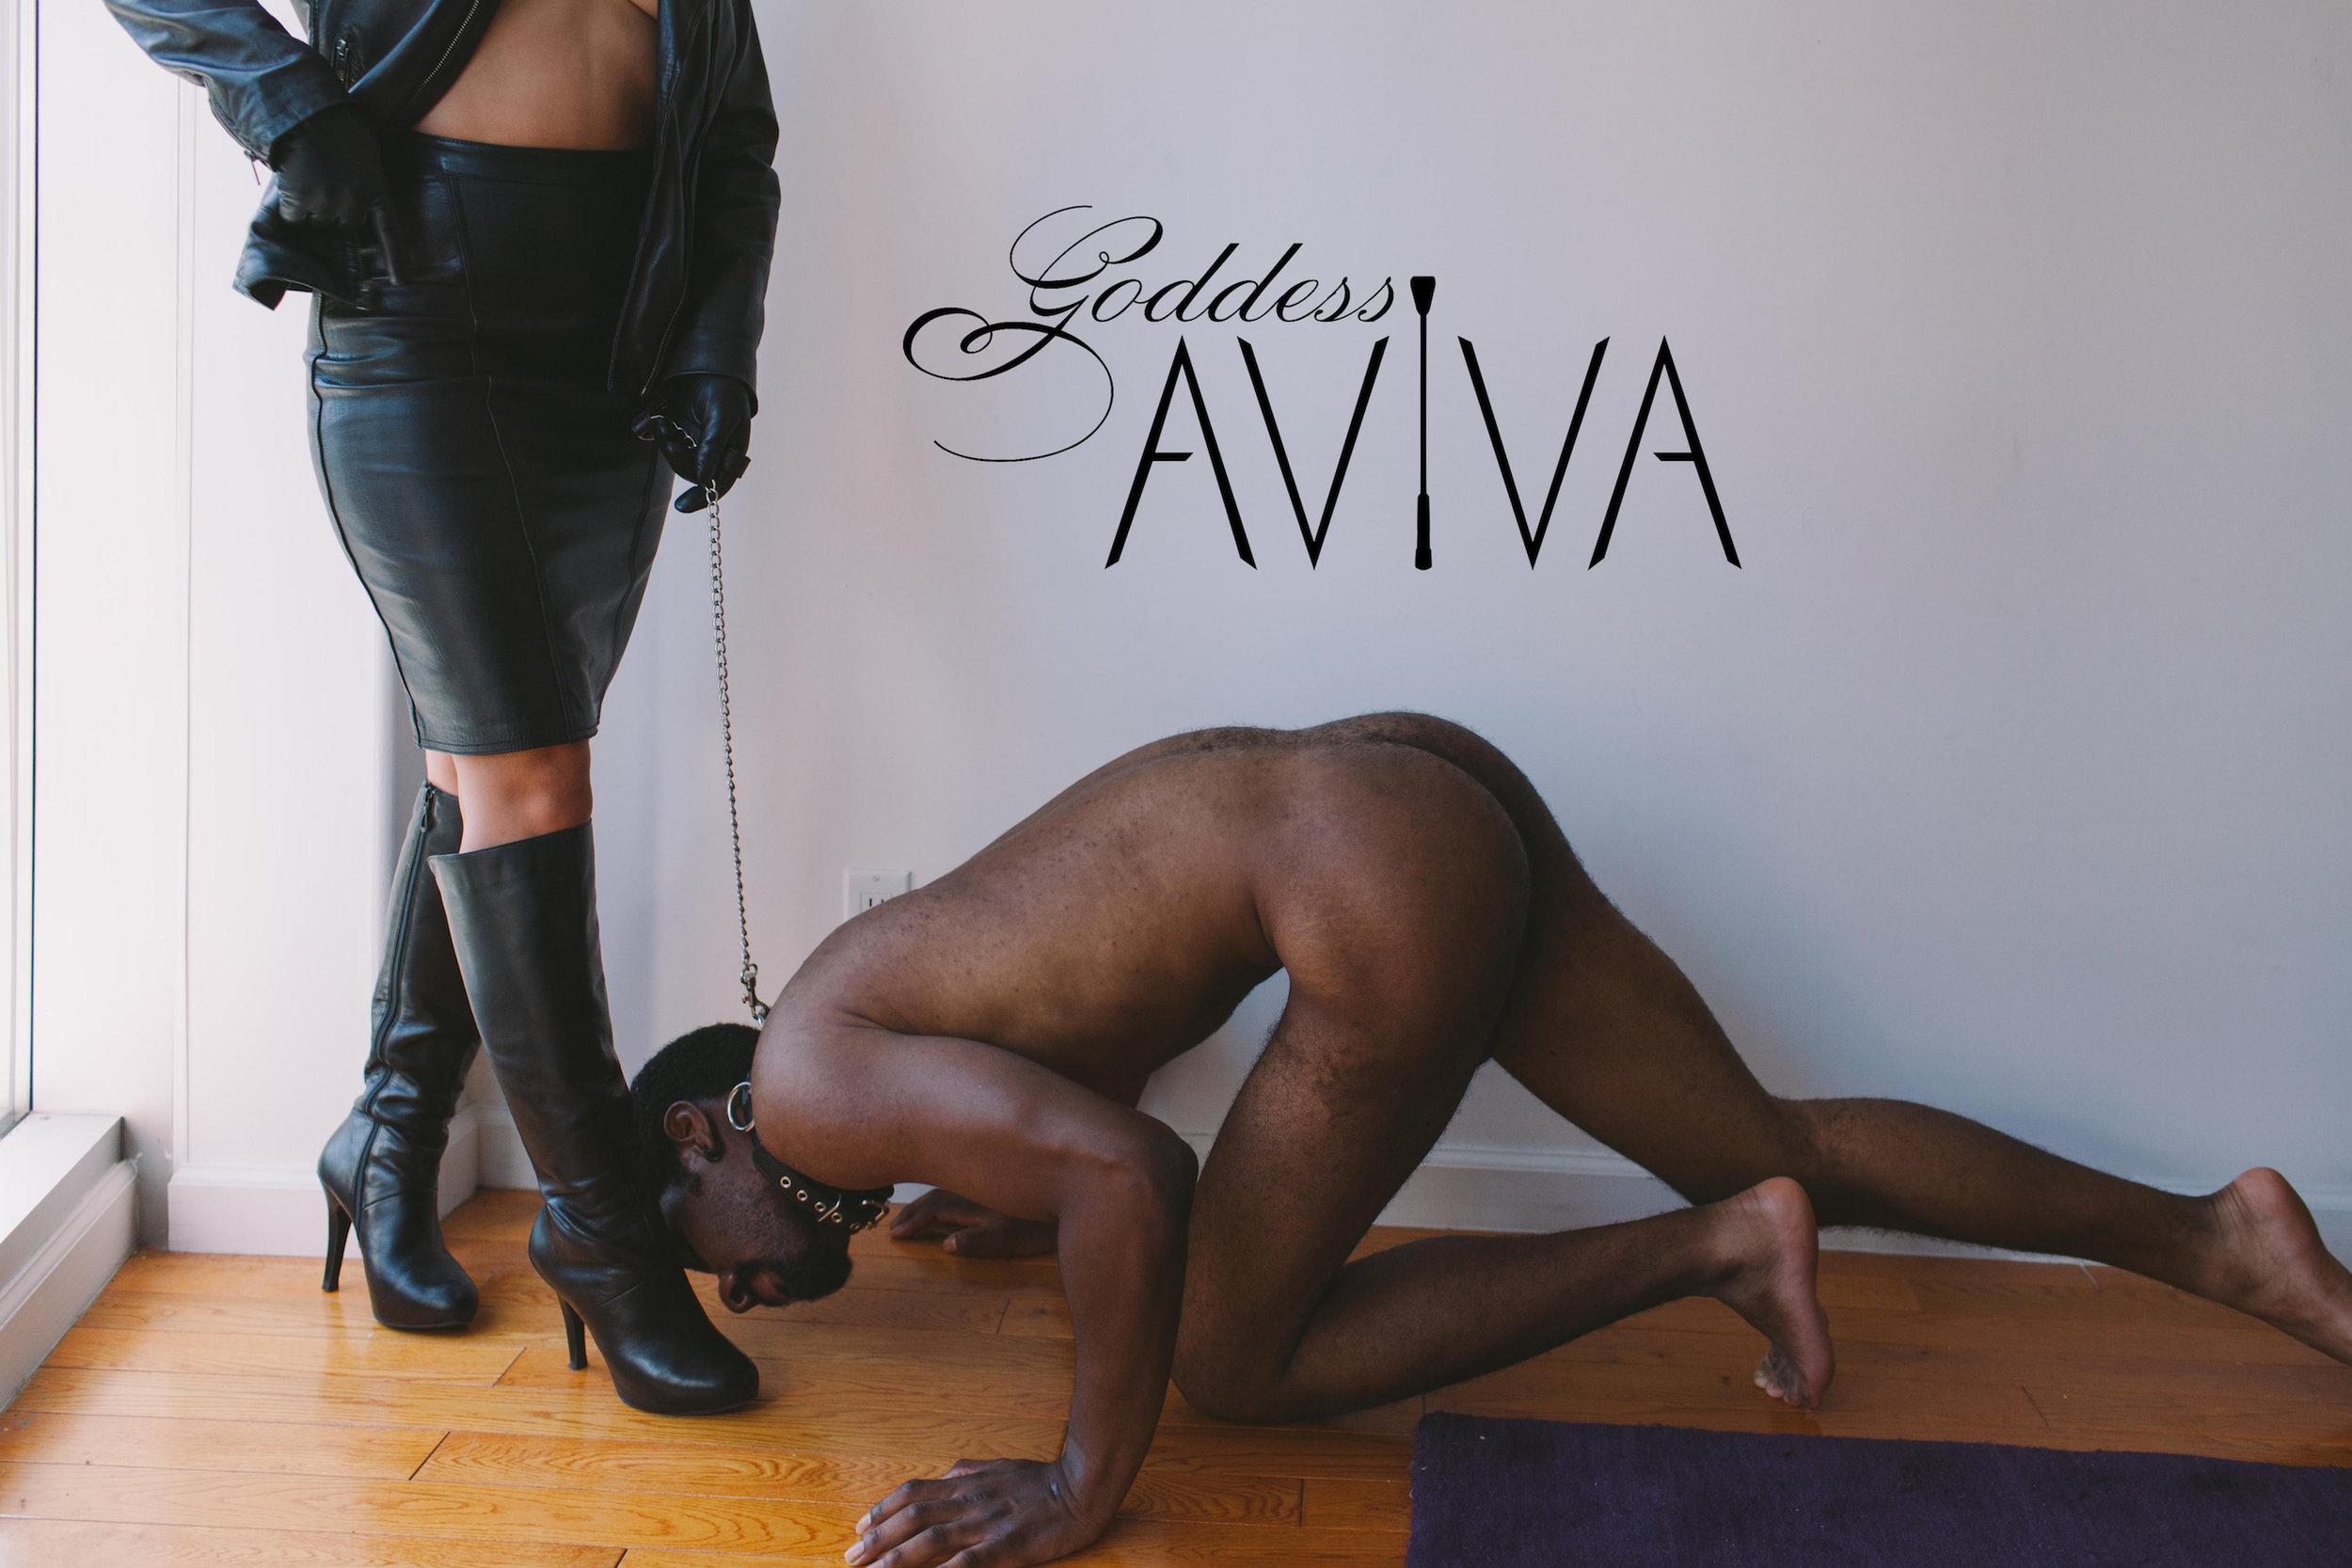 leather_slave2.jpg